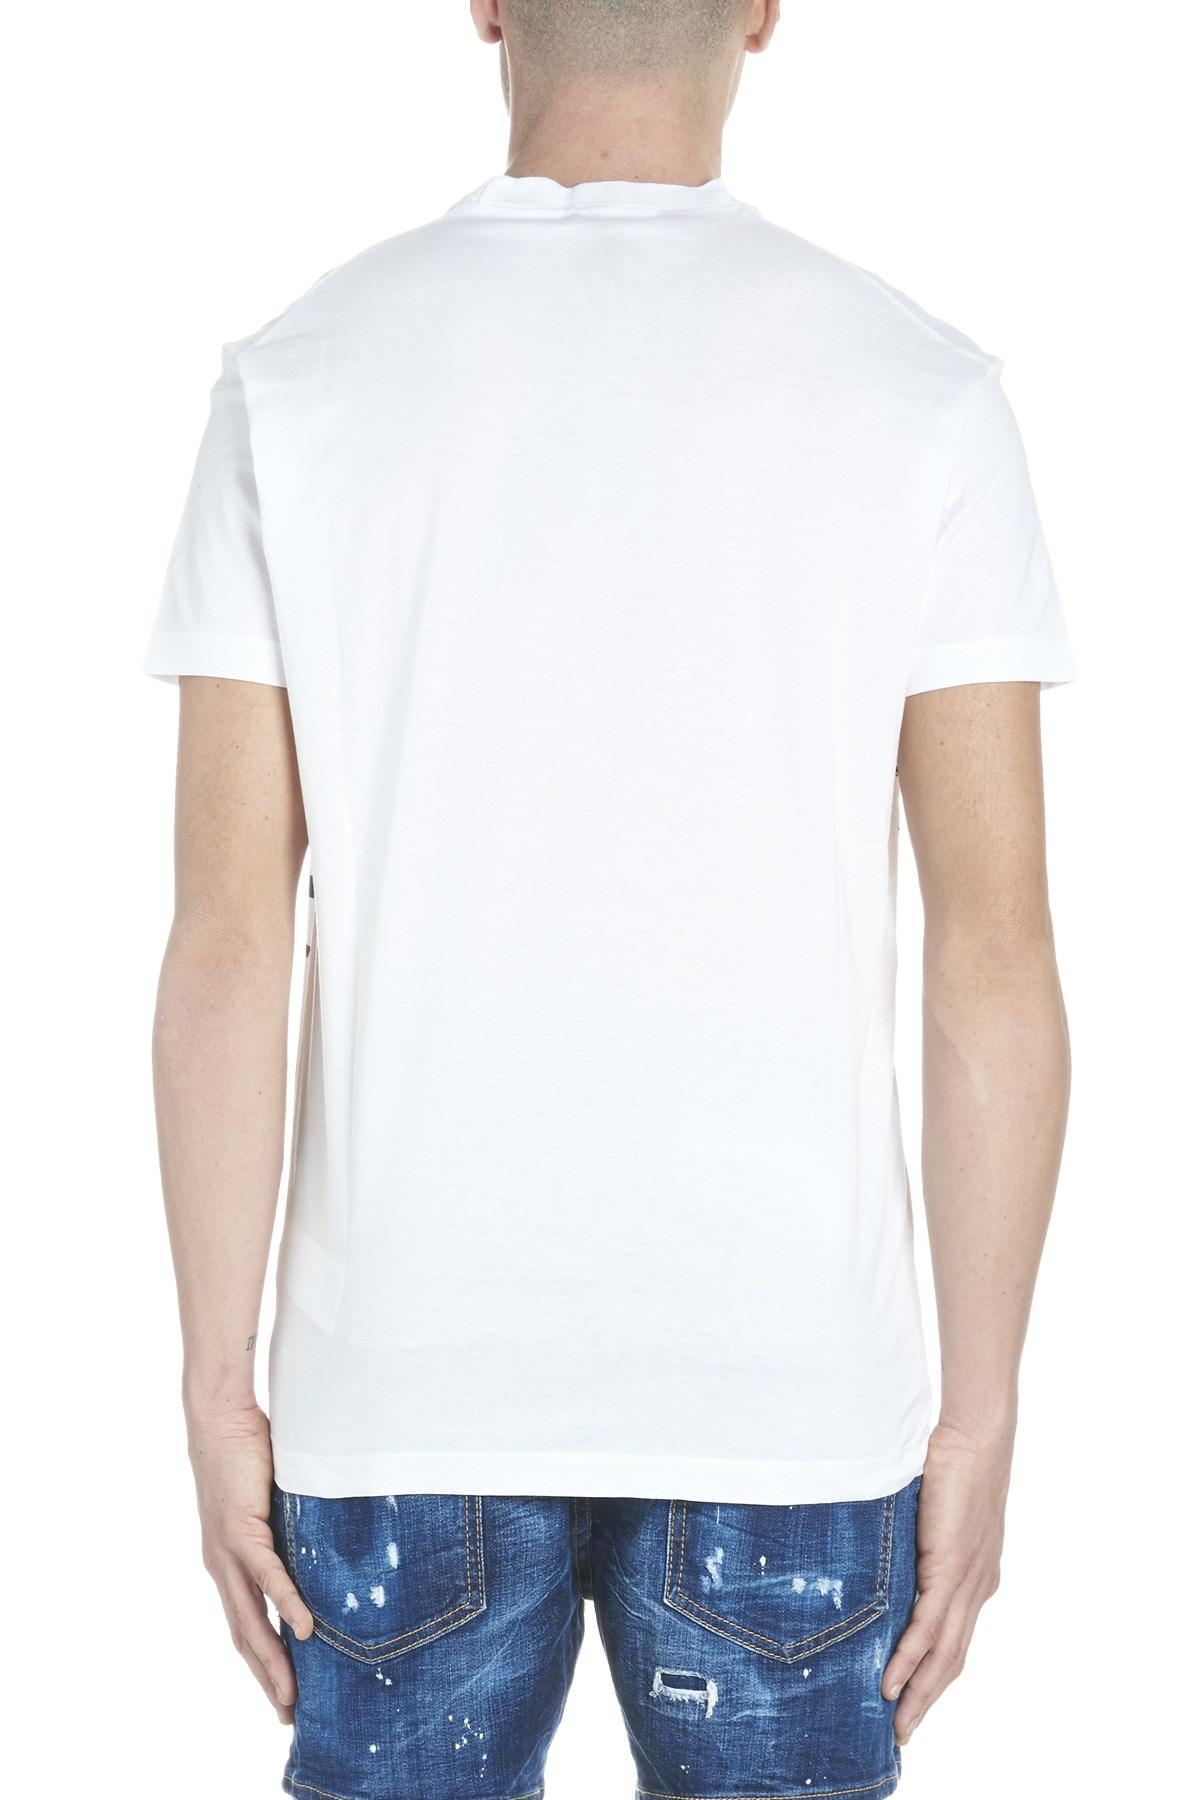 Dsquared2 Acid Glam Punk T Shirt Available On Julian Fashion